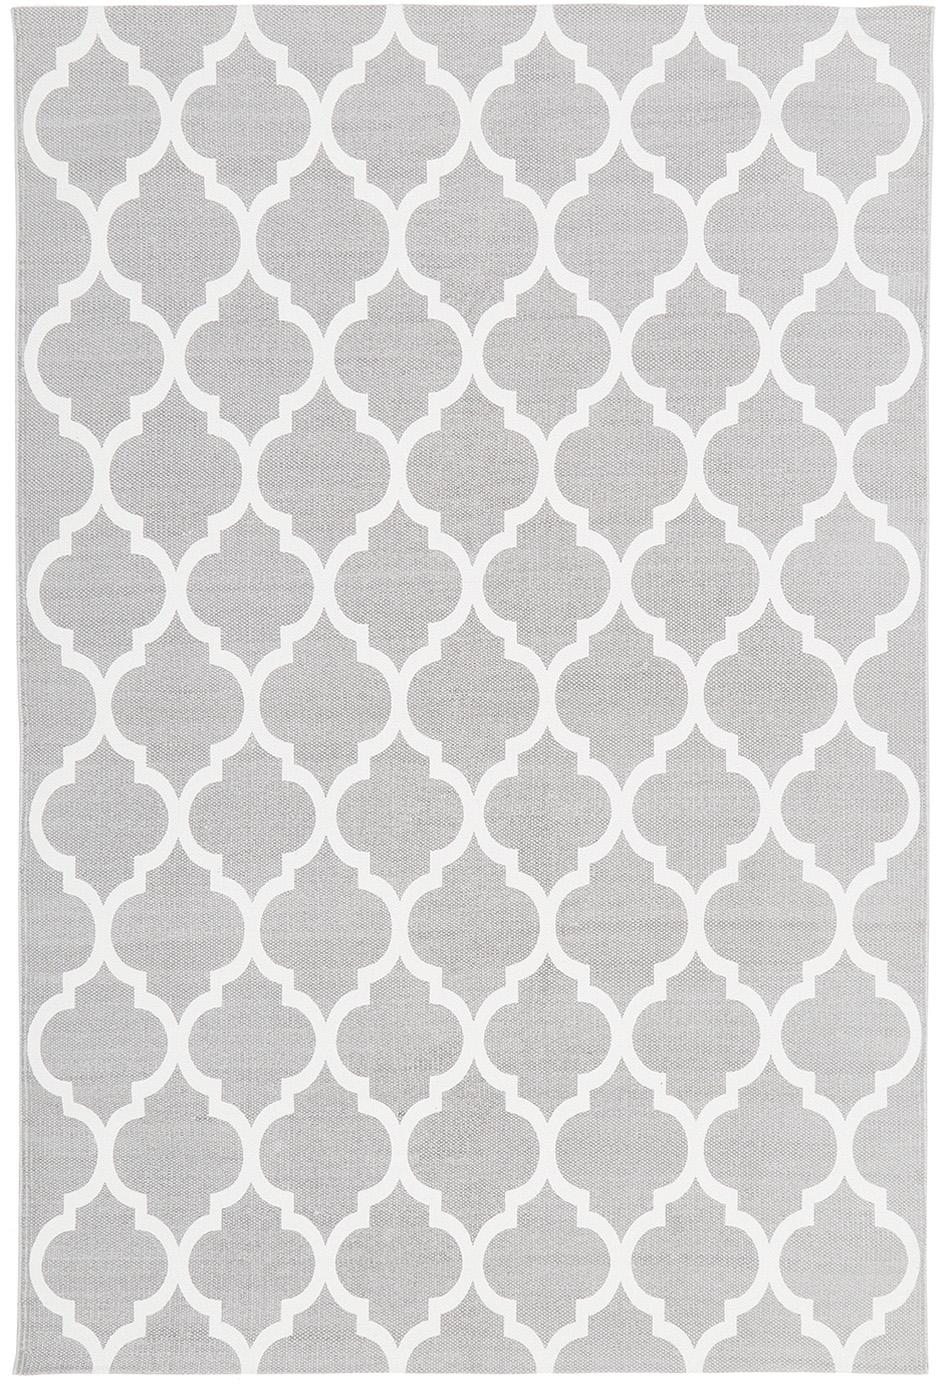 Flachgewebter Baumwollteppich Amira in Grau/Weiss, 100% Baumwolle, Hellgrau, Cremeweiss, B 120 x L 180 cm (Grösse S)